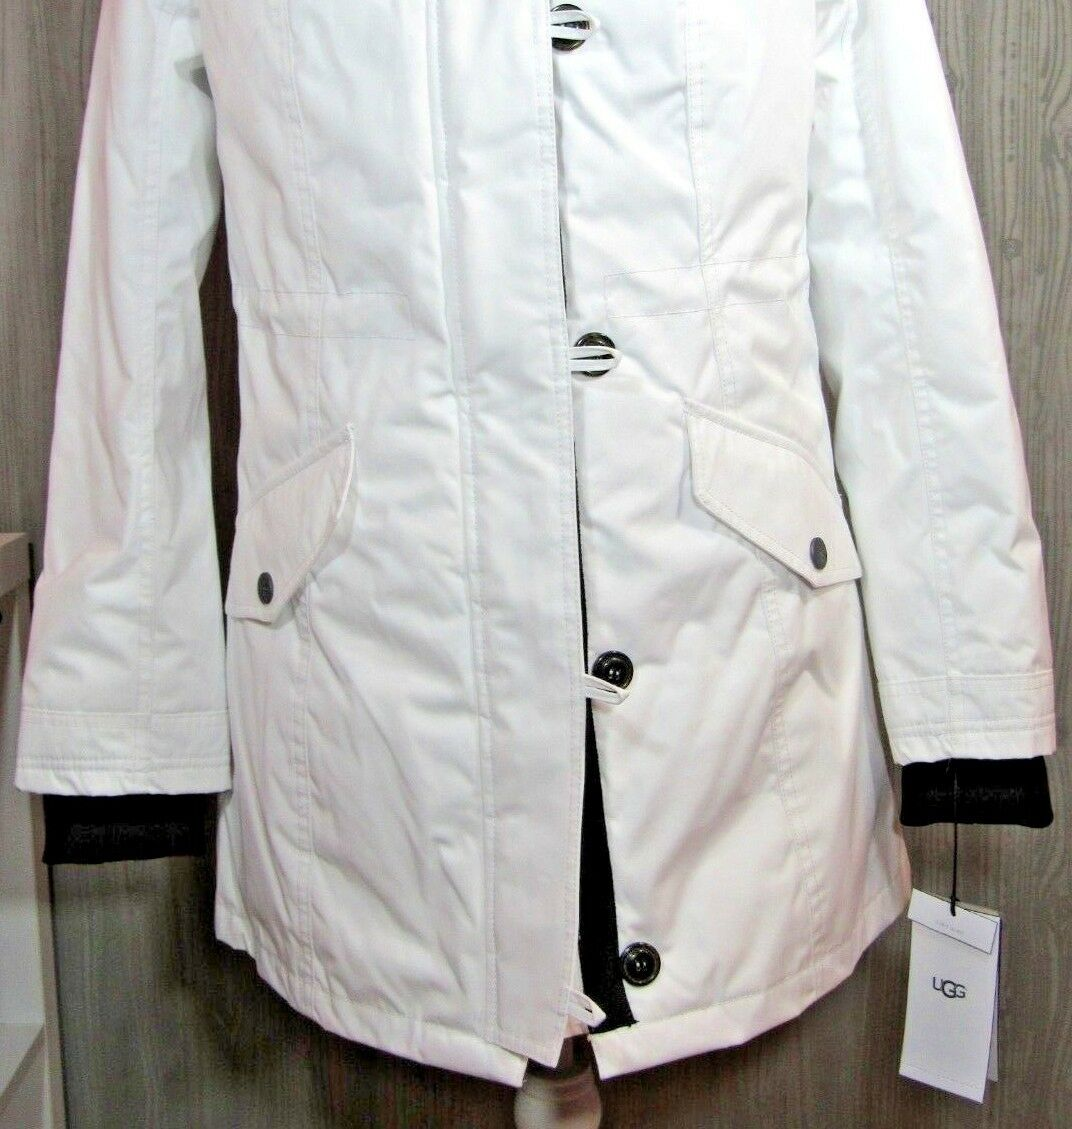 36201f5610d UGG Australia Adirondack Parka 1017640 Toscana Hooded 3 in 1 Removeable  Vest WHT